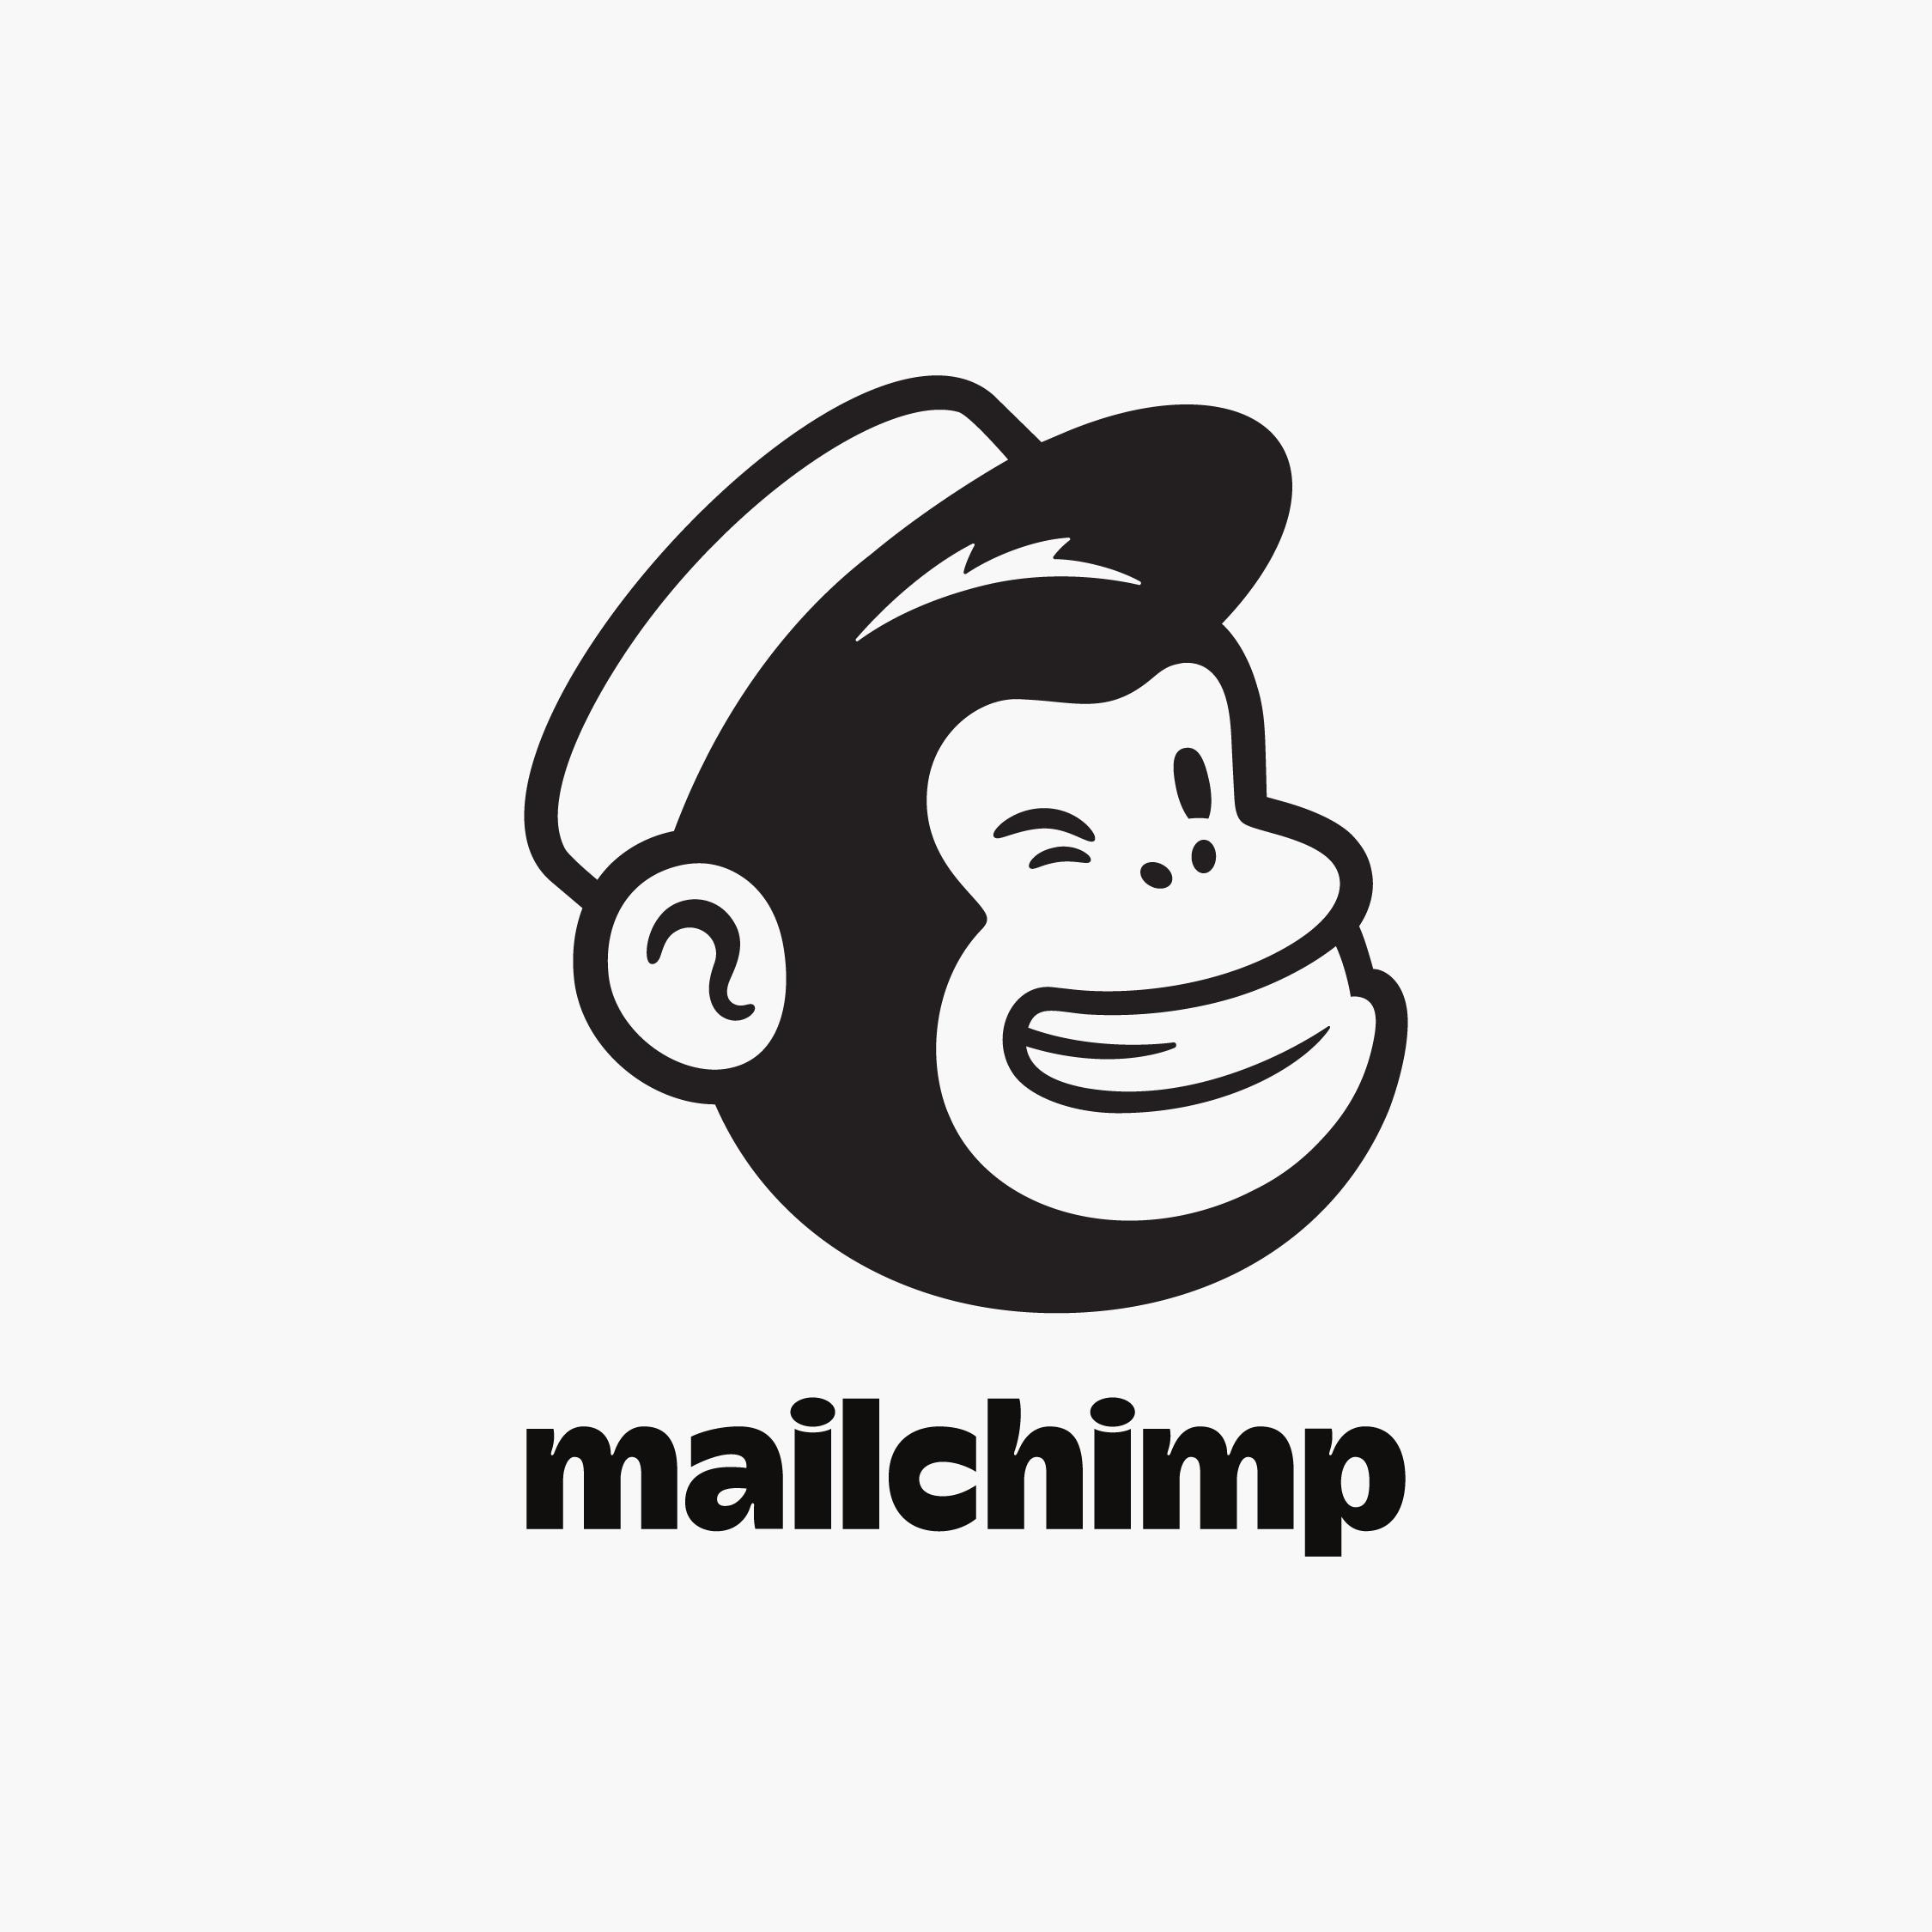 mailchimp_Simone Staffieri